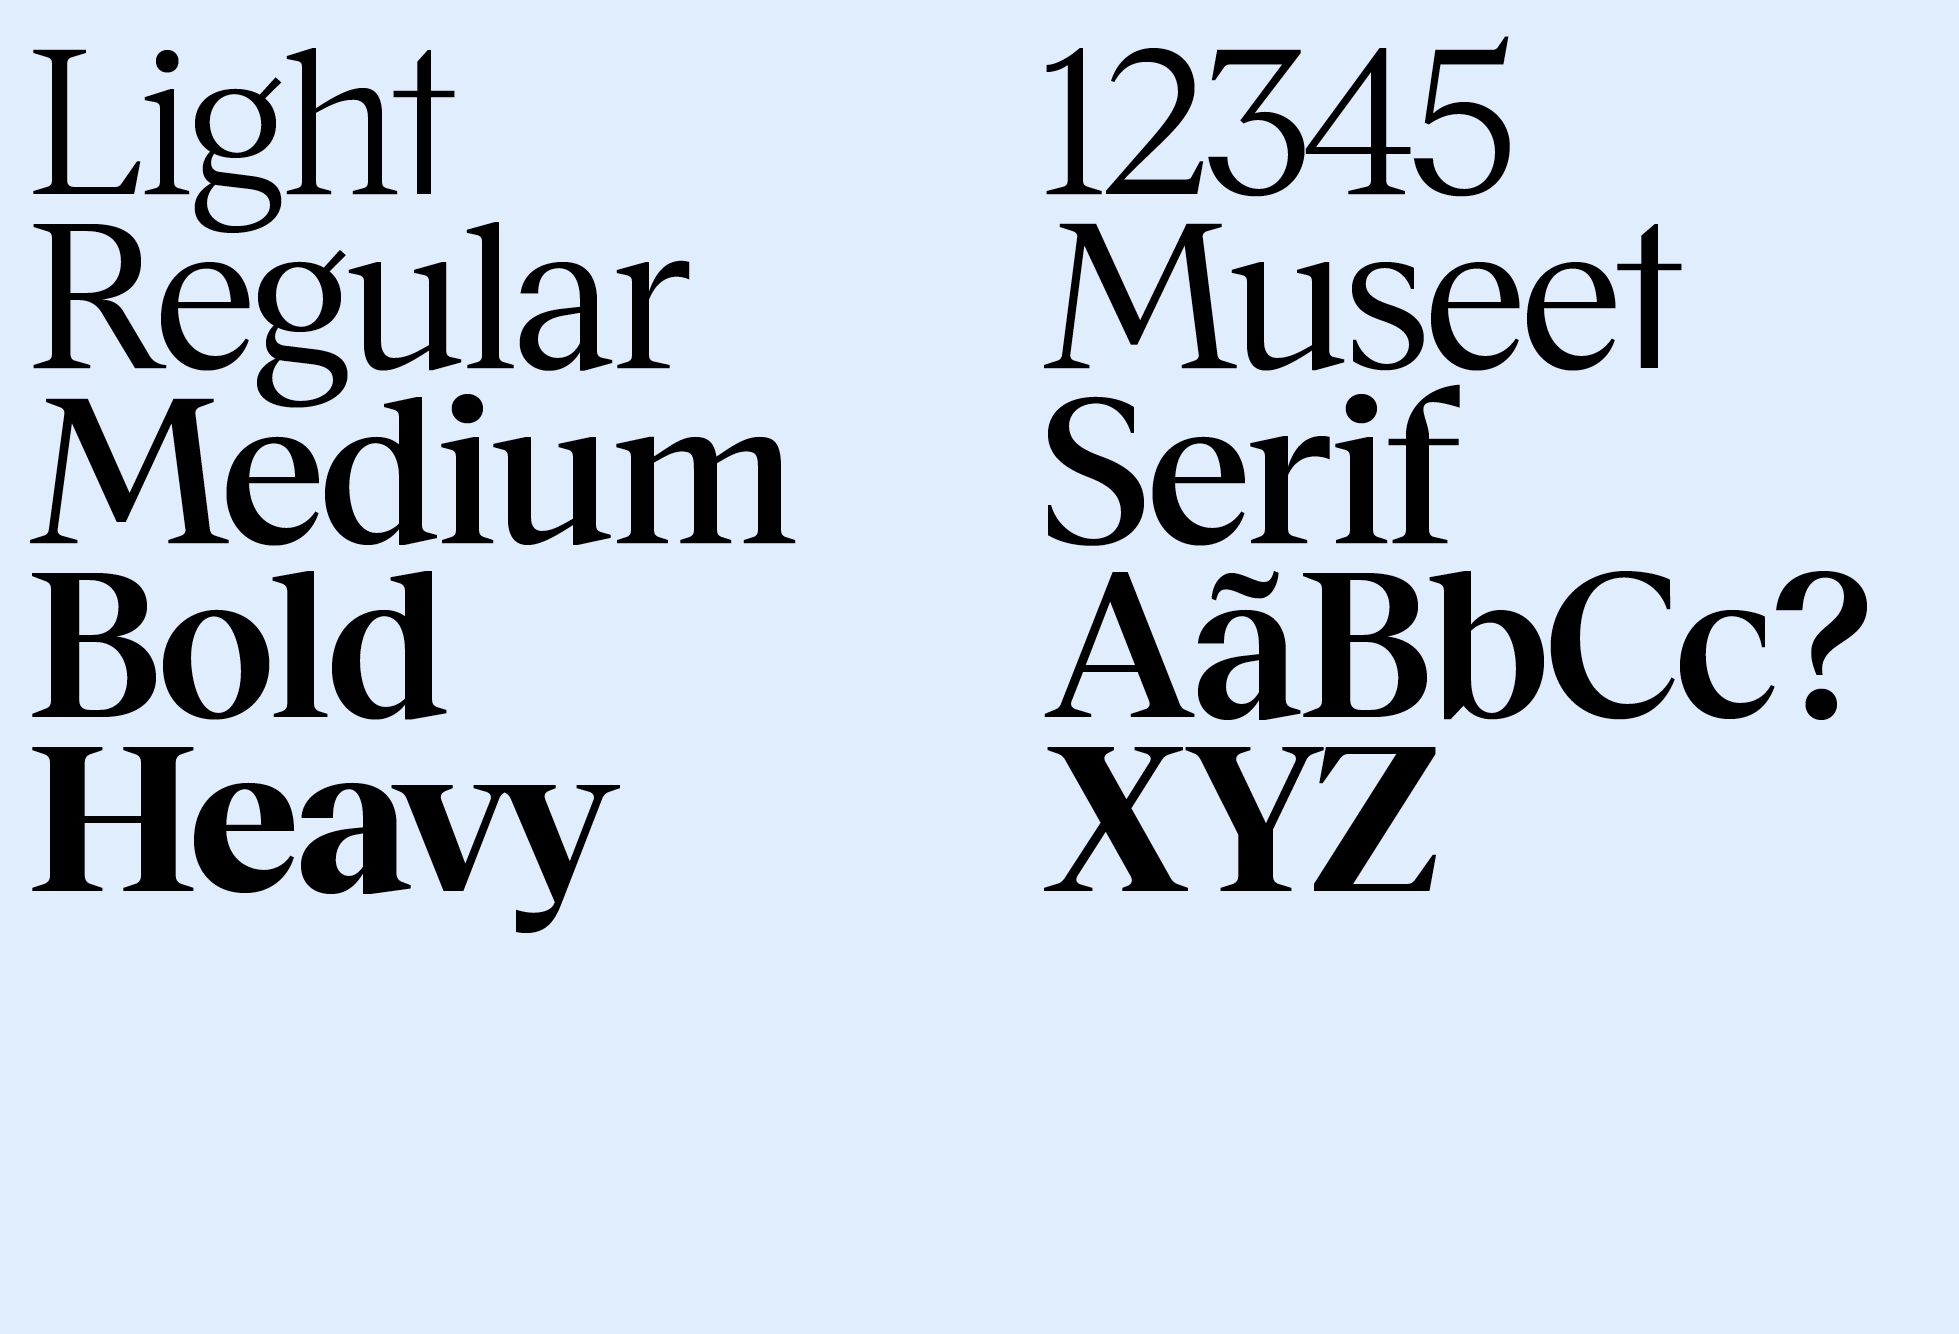 Museet Serif (Weights & Styles)